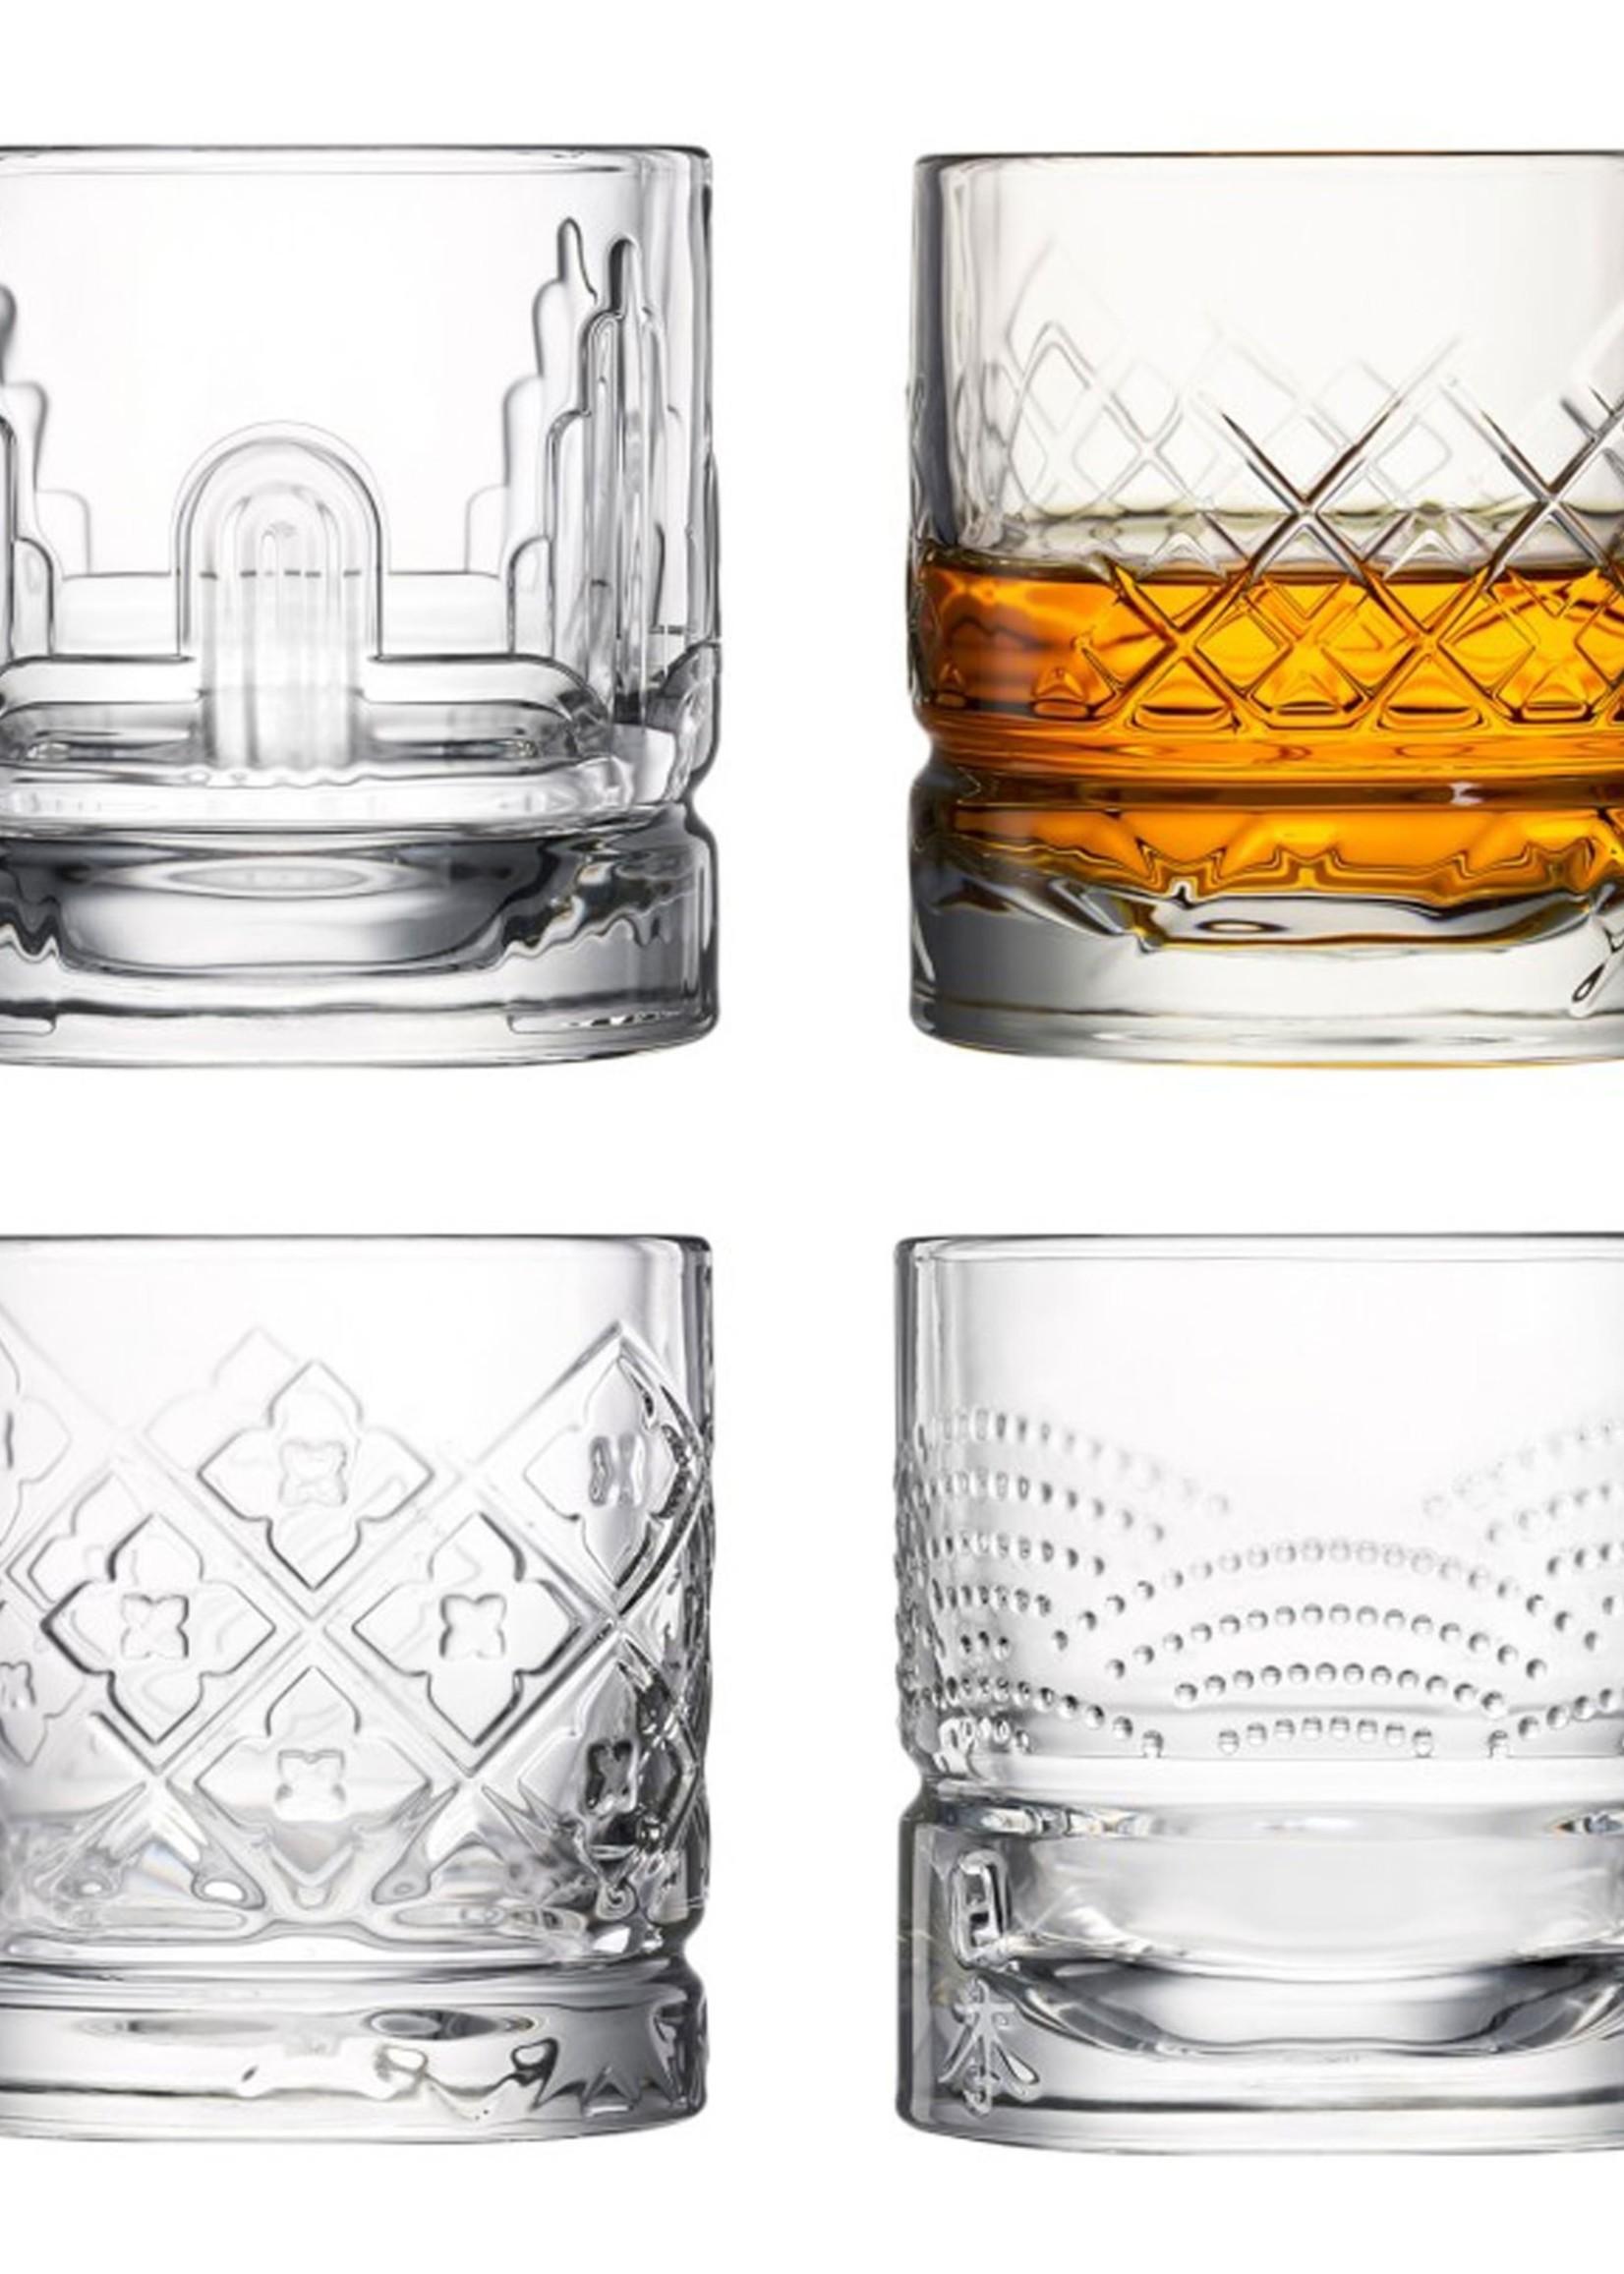 Dandy Whiskey Glass